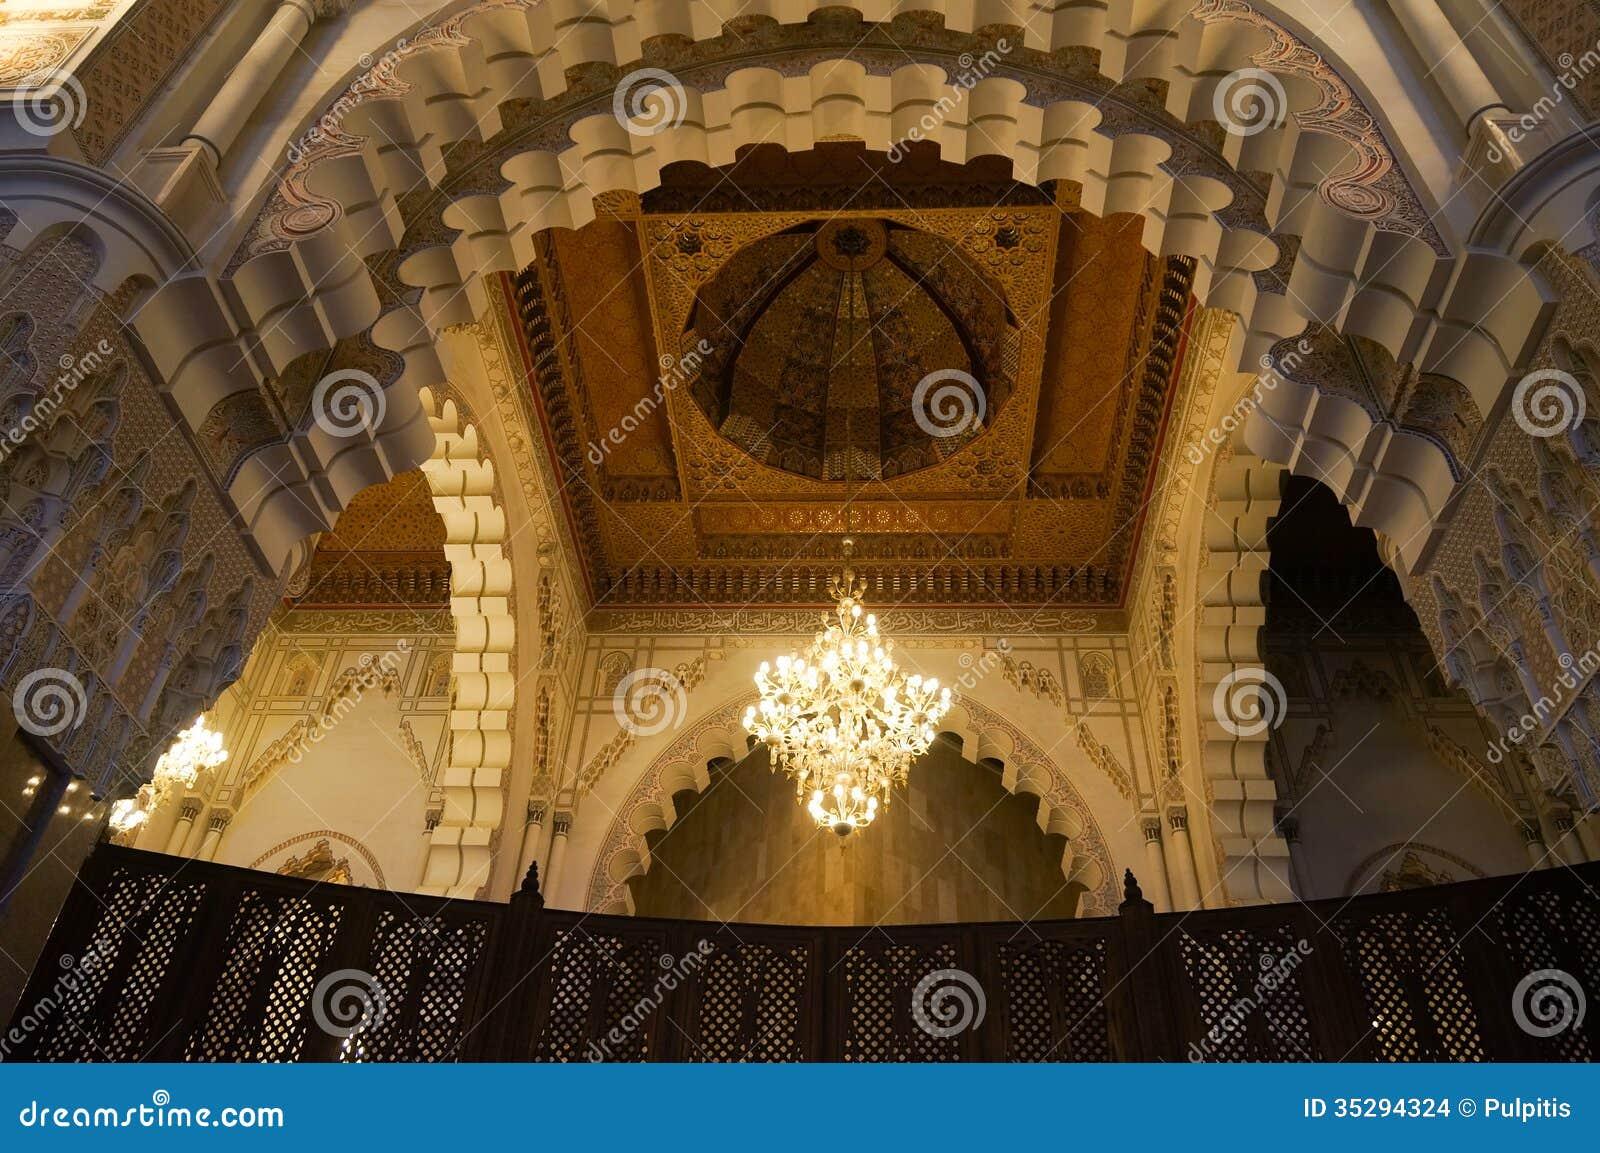 Chambre forte int rieure de mosqu e de hassan ii for Mosquee hassan 2 interieur